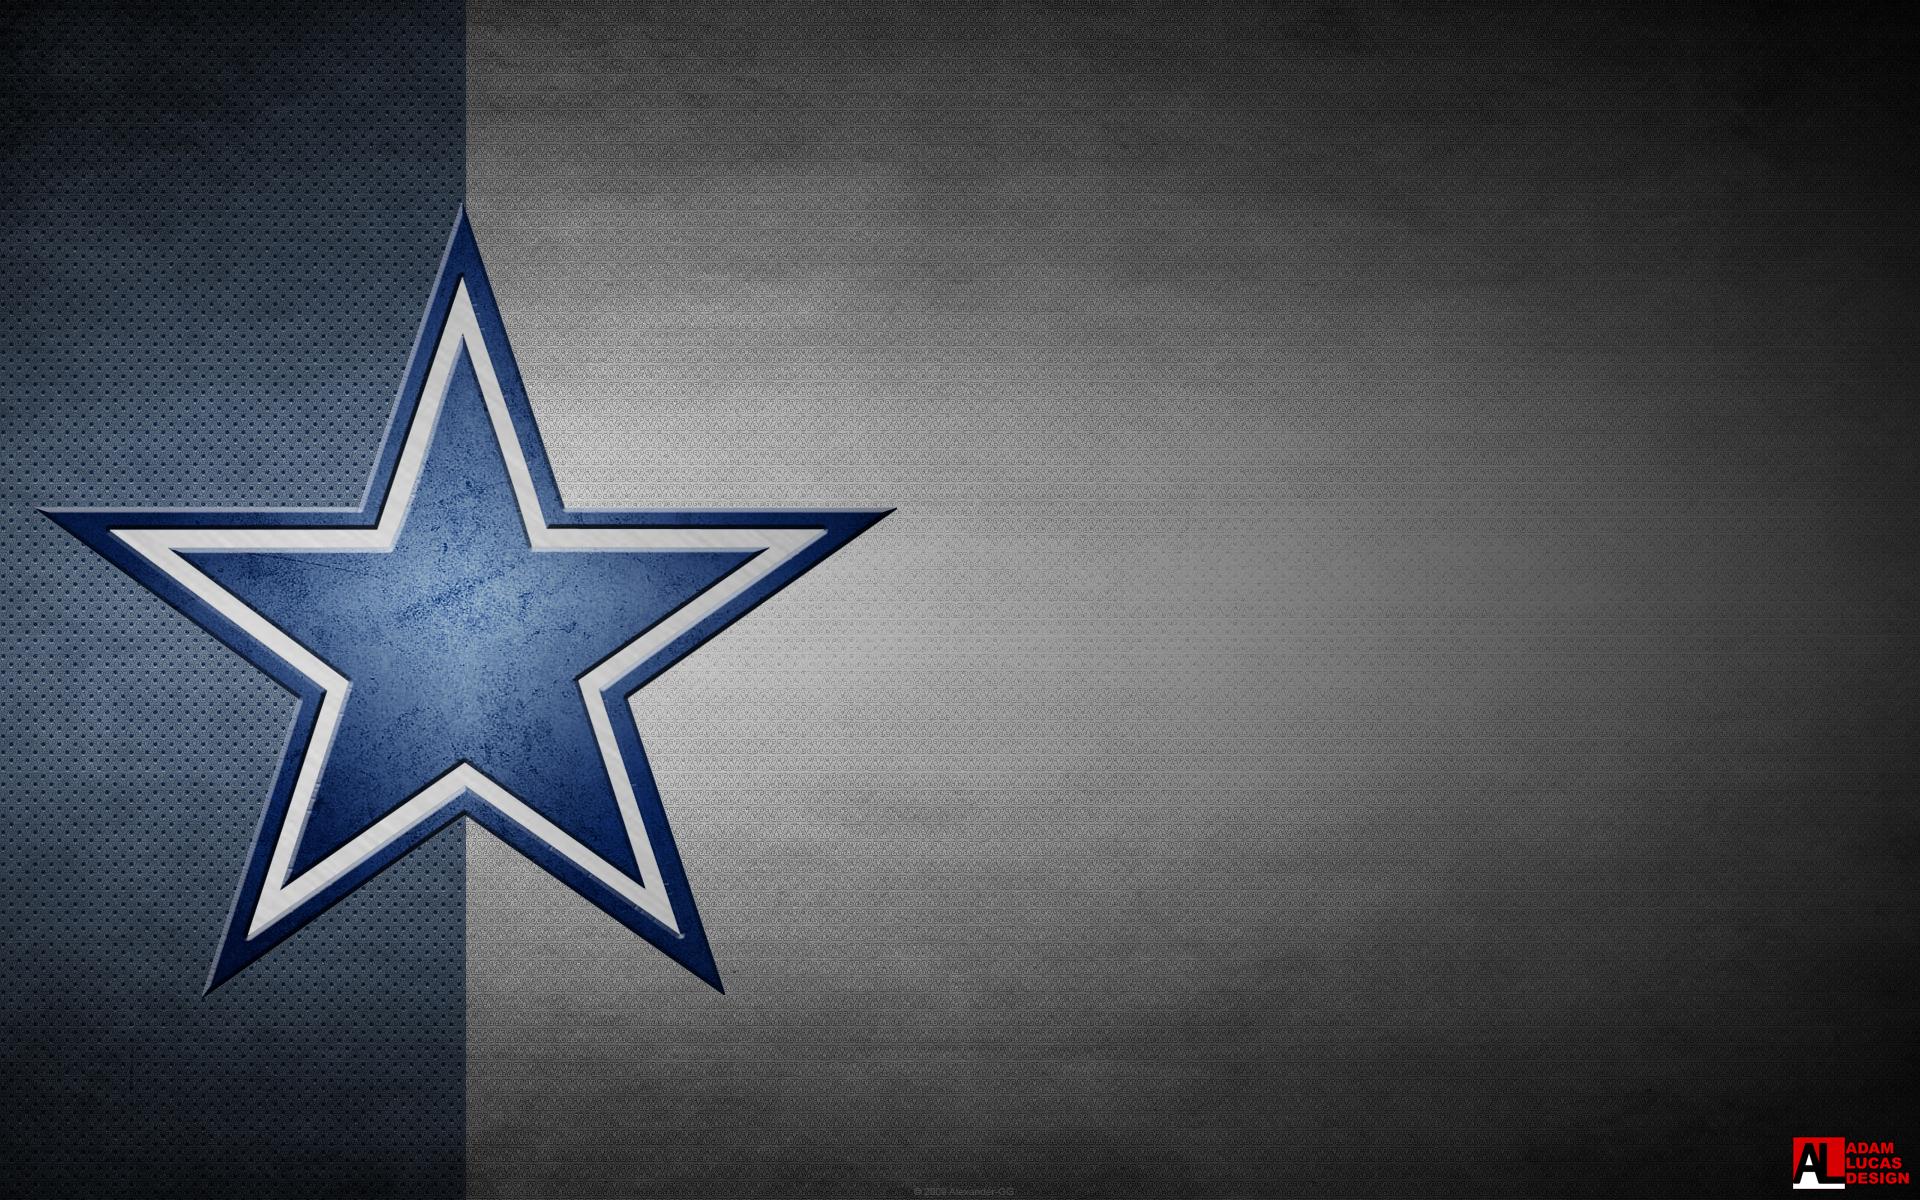 Dallas Cowboys Wallpaper For Desktop 1920x1200